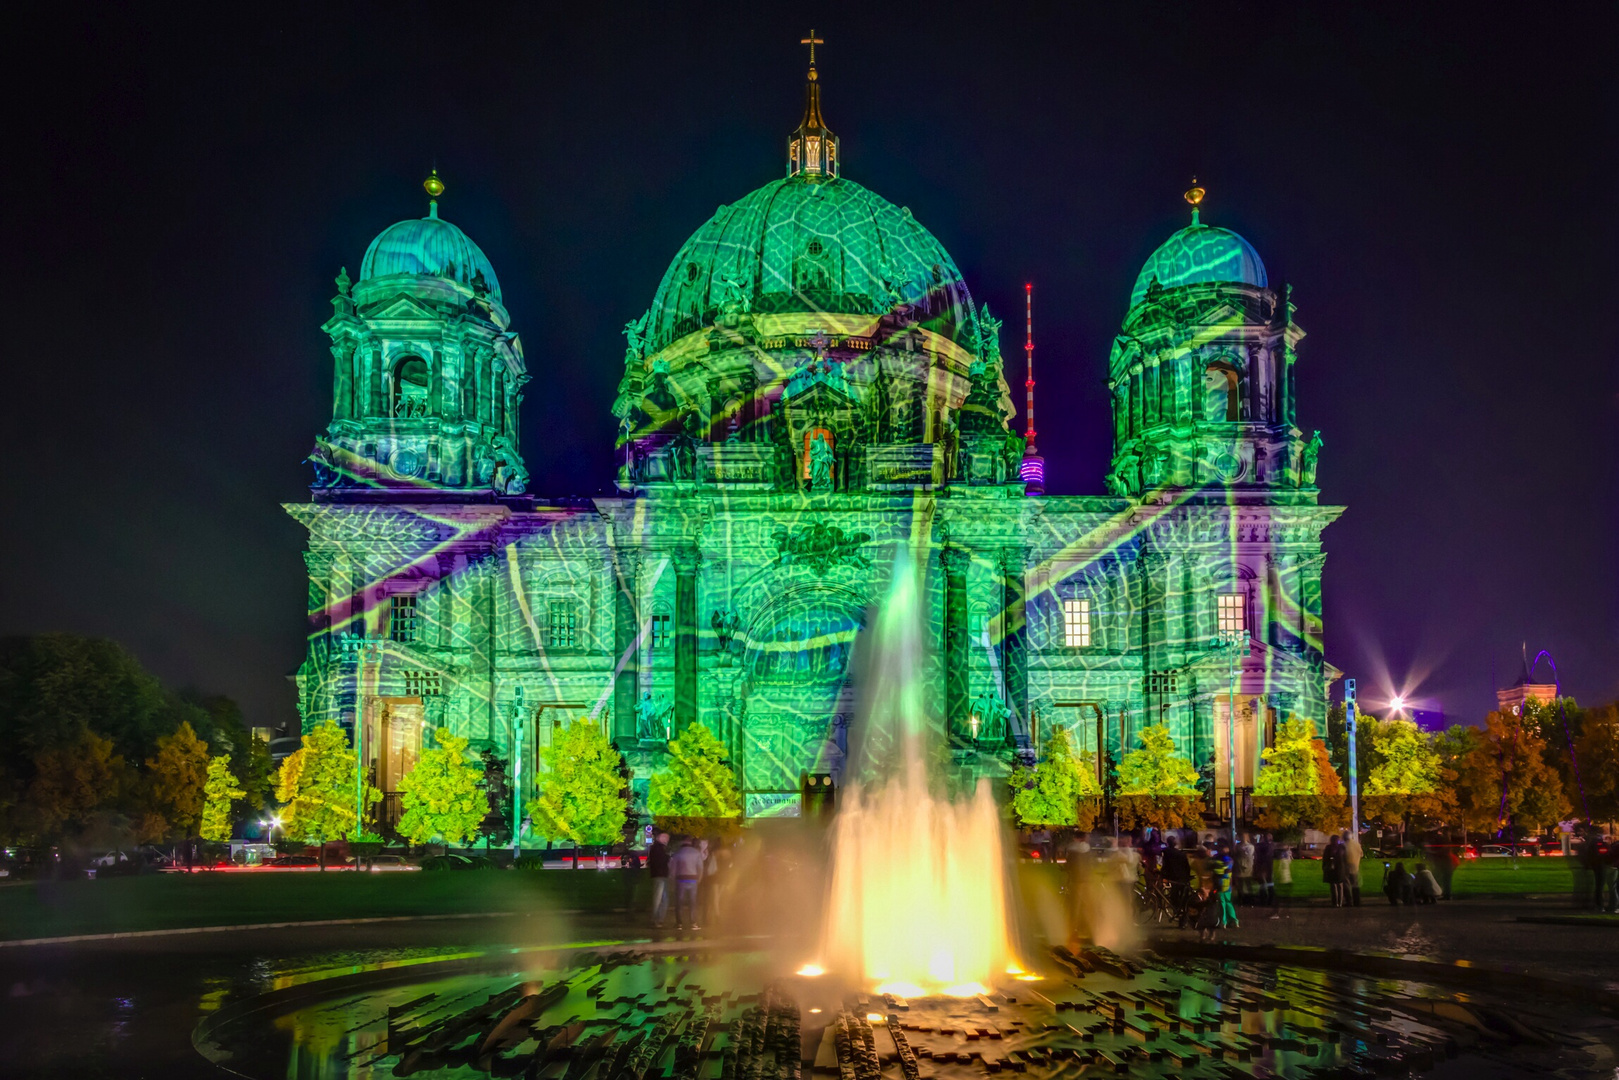 Festival of Lights 2013 - Berliner Dom